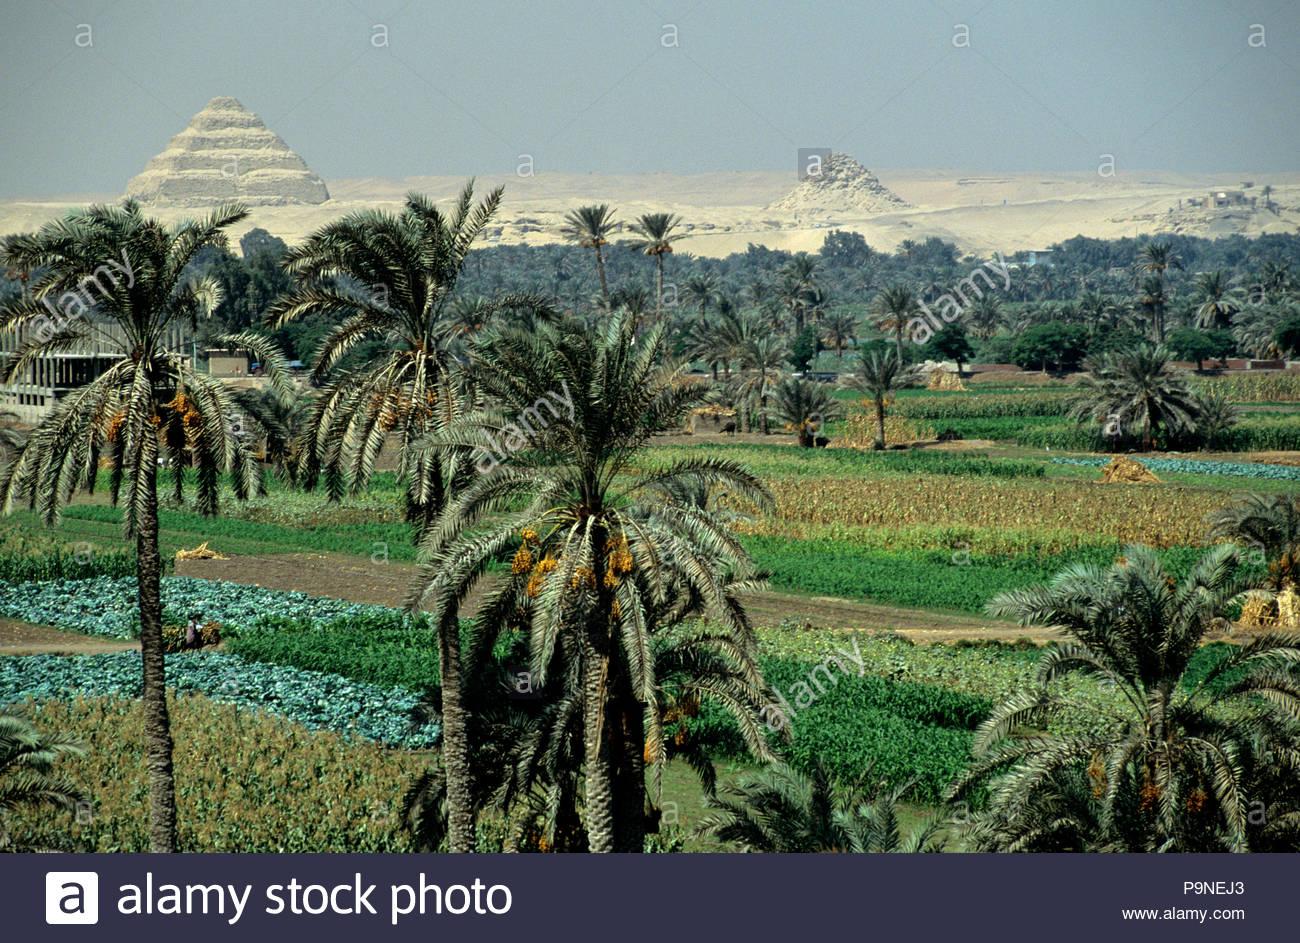 Djoser's step pyramid complex rises beyond lush farm land. Stock Photo